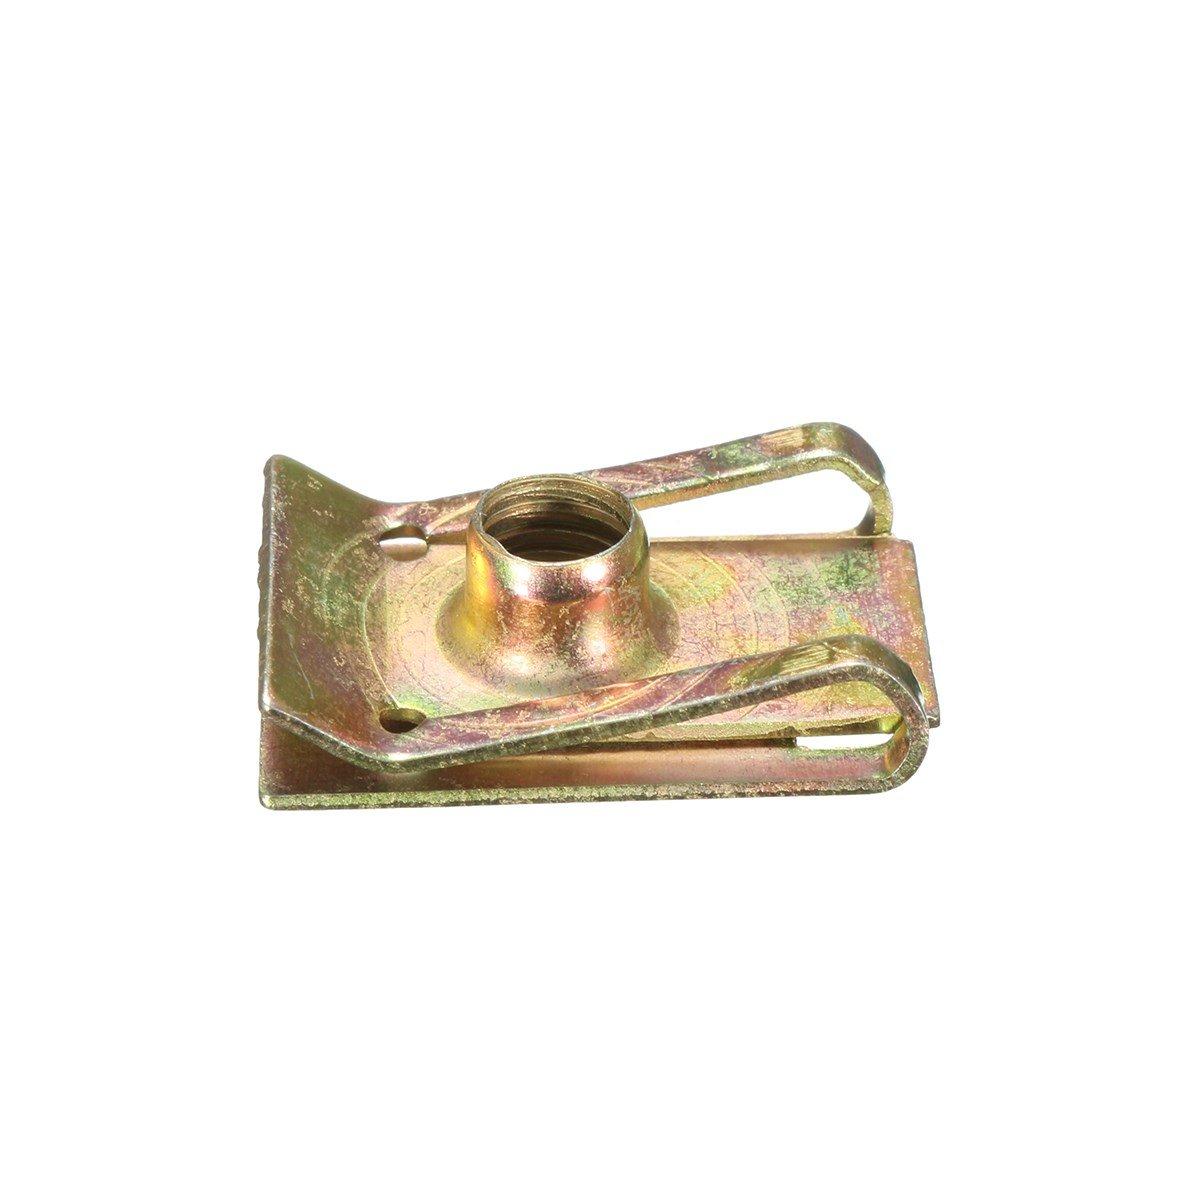 Oneuda 50pcs M6 6mm Tread Panel Spire Nut Fairing Clip Fastener Speed Zinc Mounting Clamp